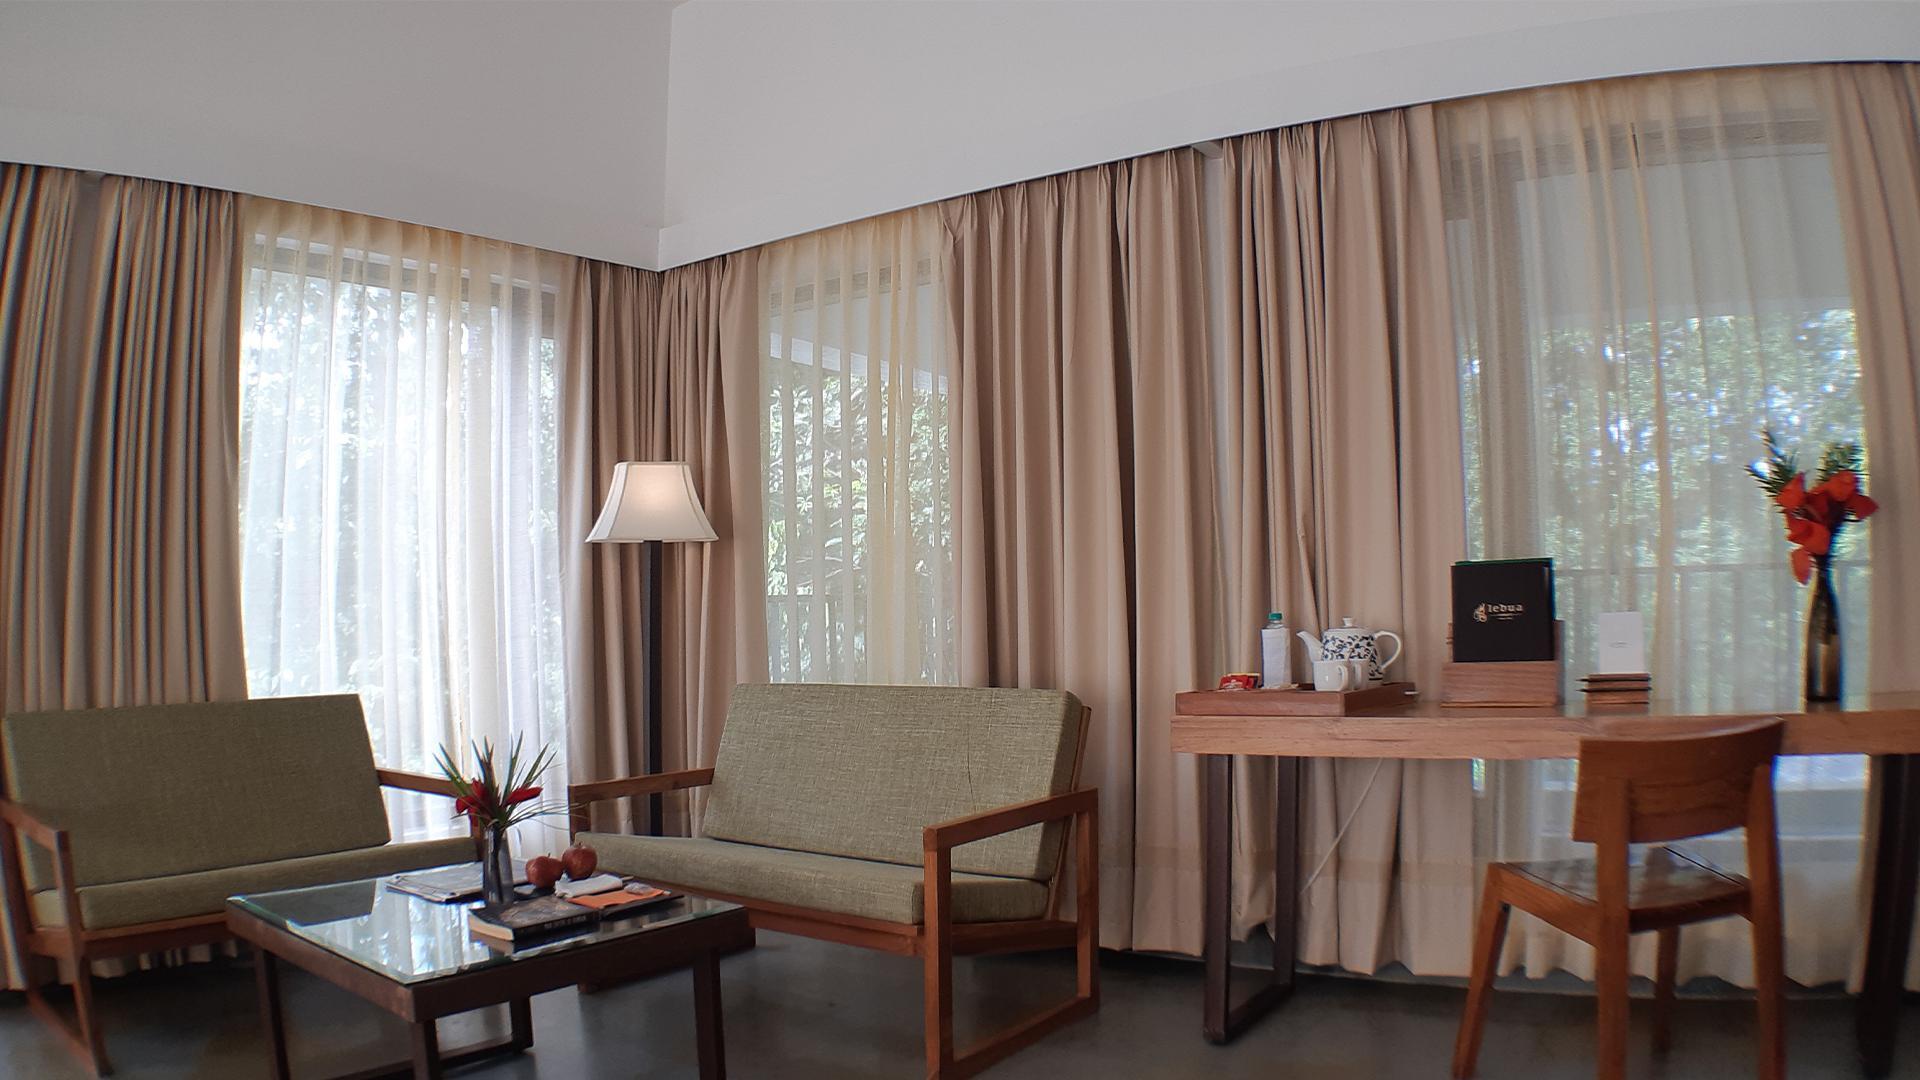 Suite image 1 at Lebua Corbett by Pauri Garhwal, Uttarakhand, India